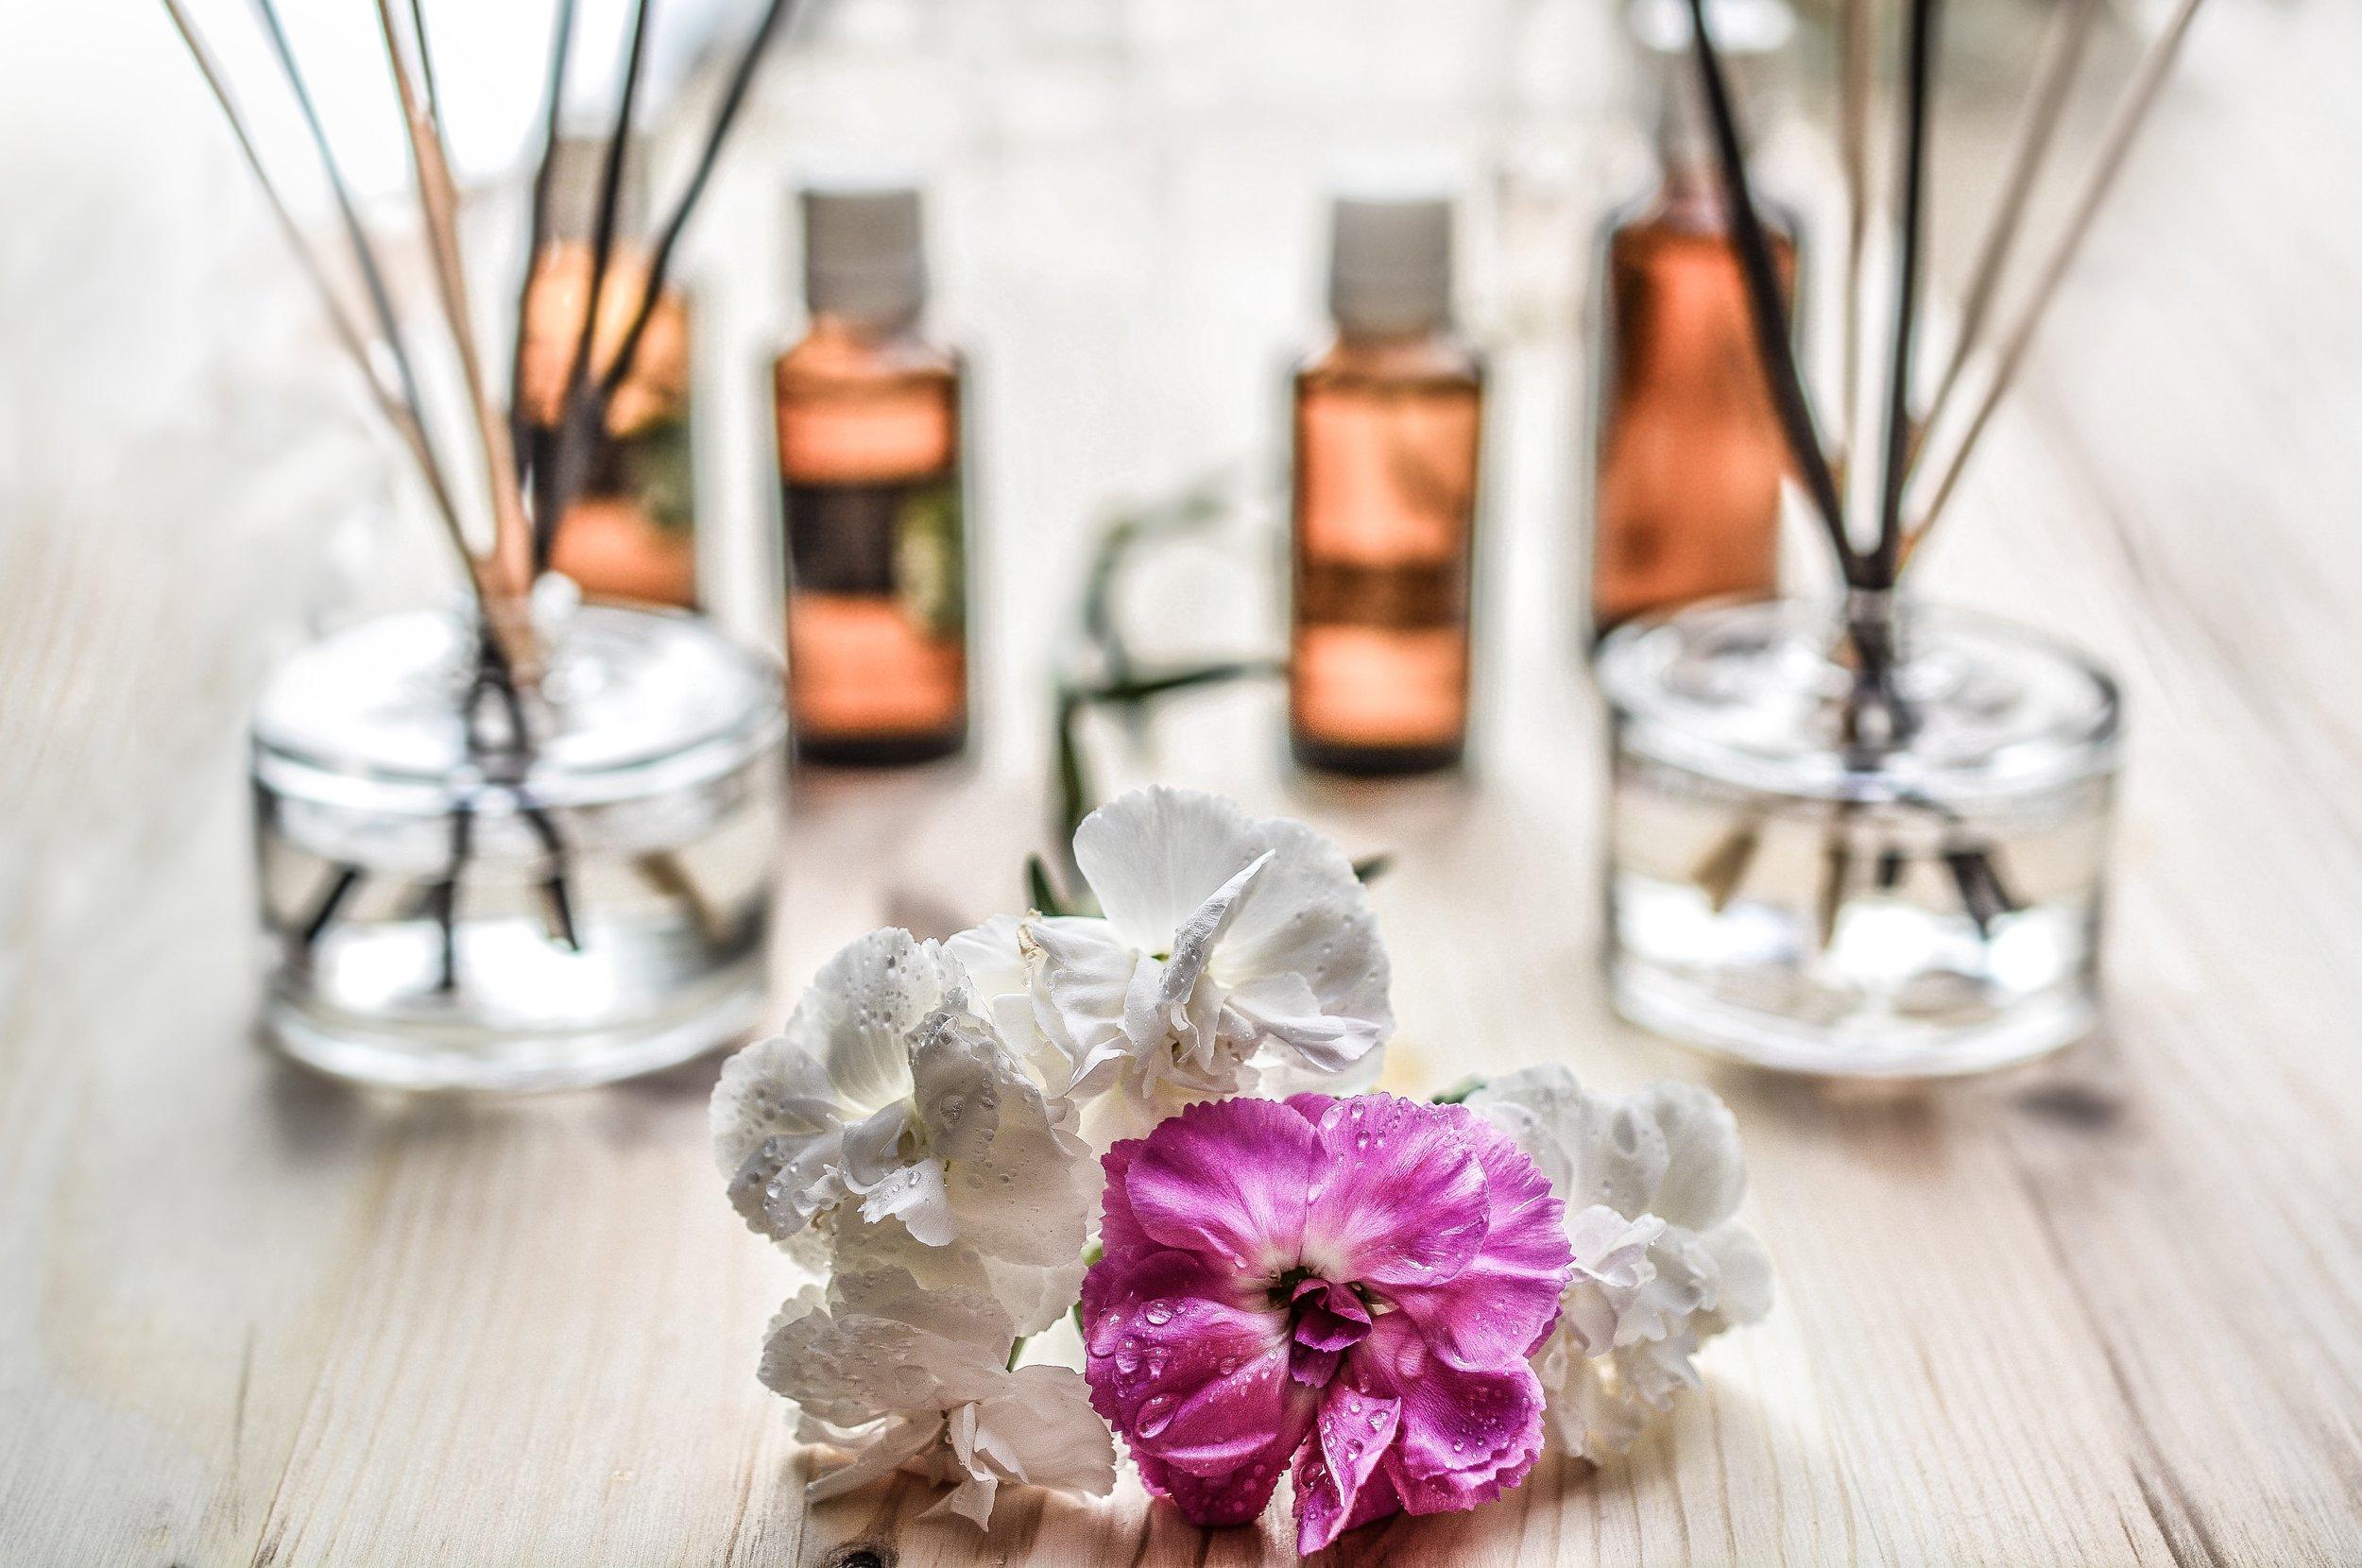 scent-sticks-fragrance-aromatic-161599.jpeg